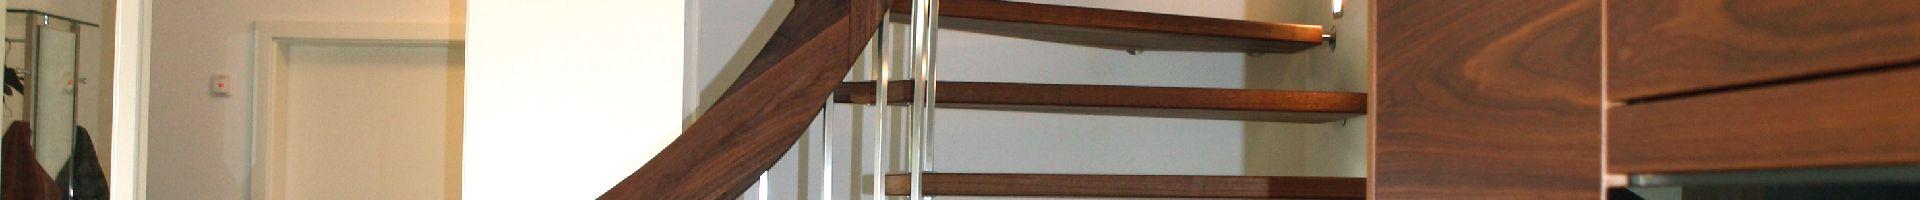 Stabtragende Treppen - offene Optik